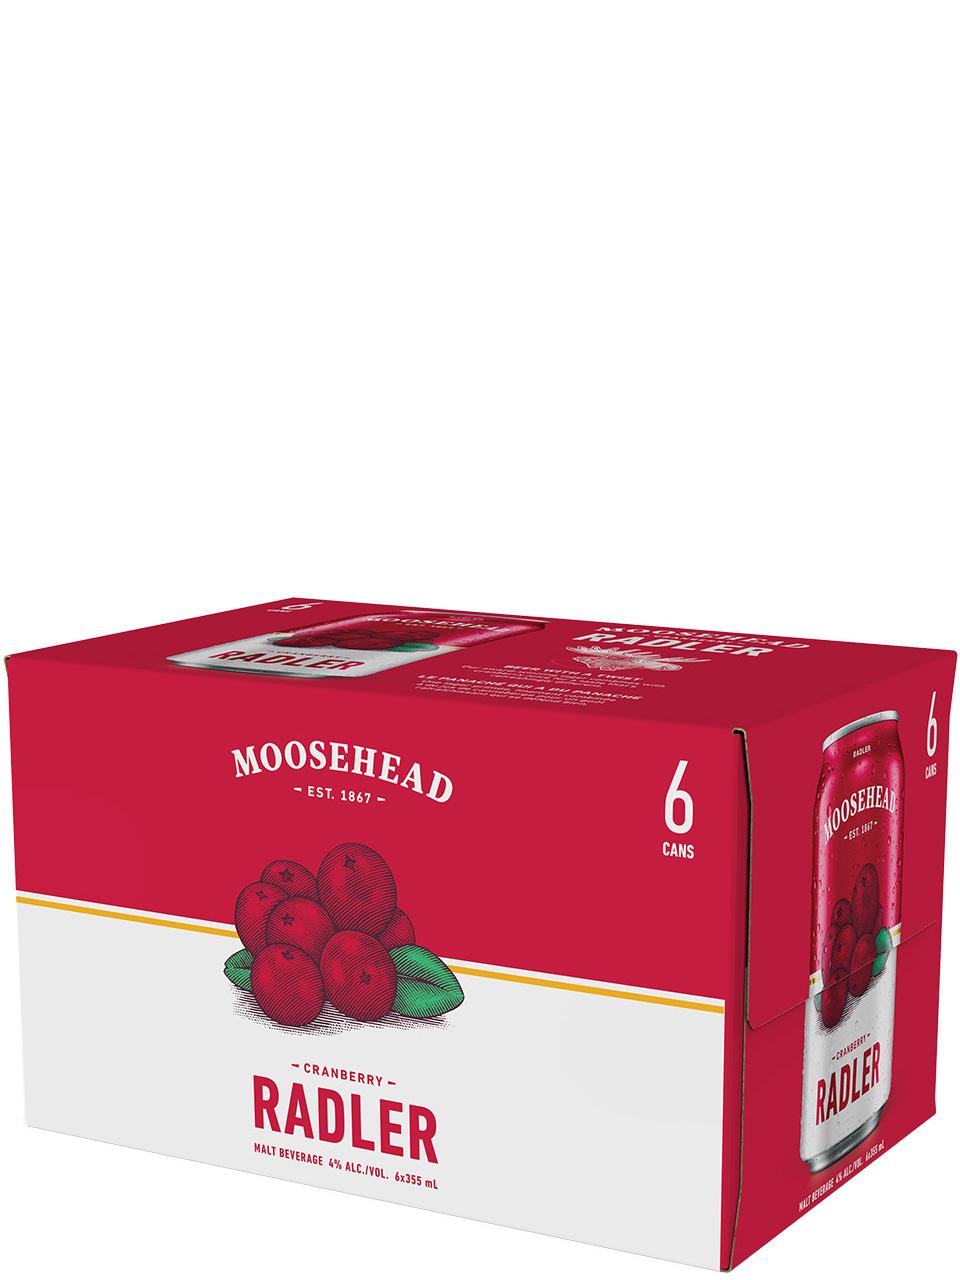 Moosehead Cranberry Radler 6 Pack Cans